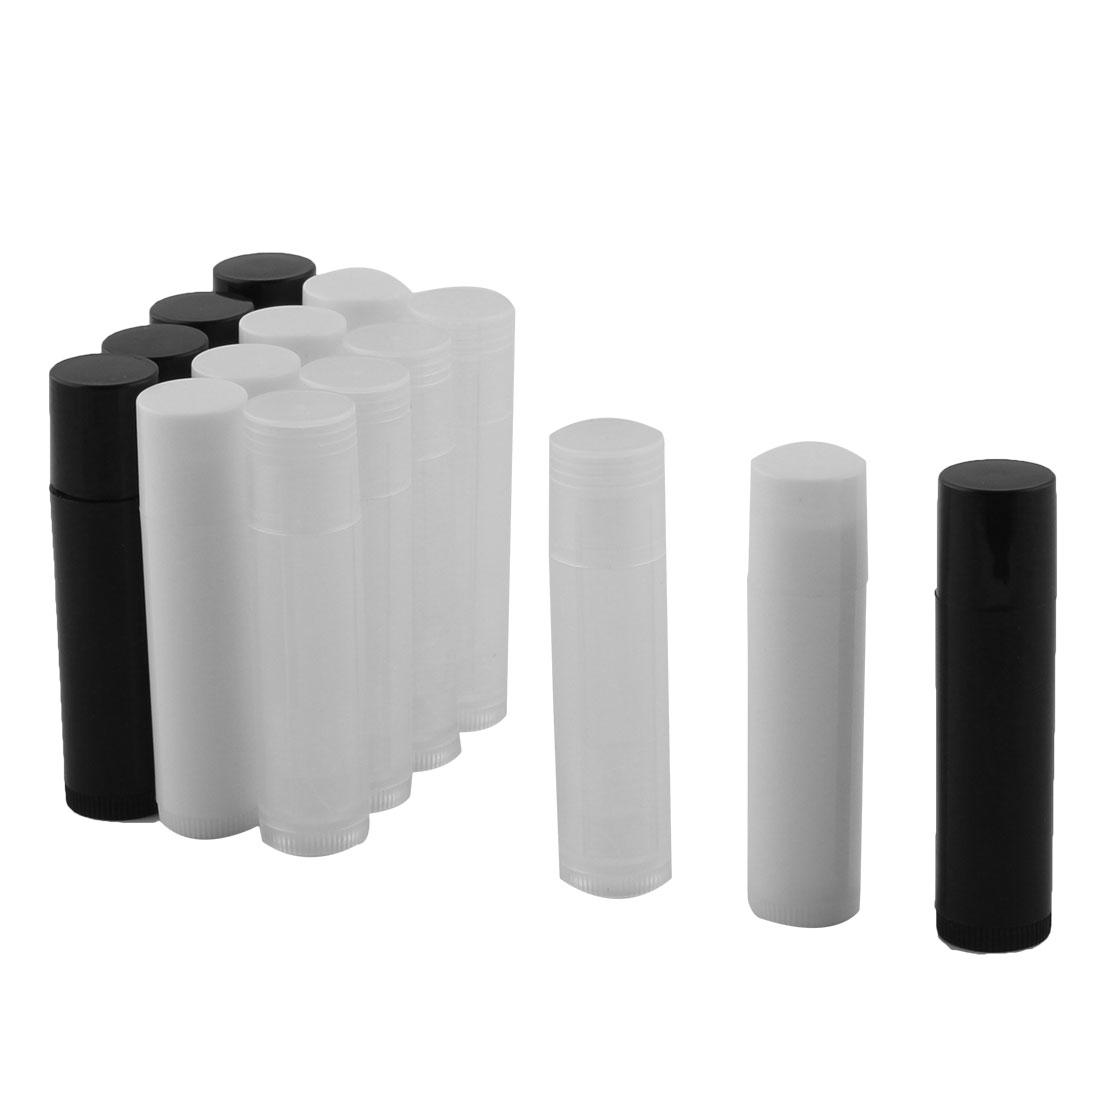 Women Plastic Empty DIY Lip Balm Tube Lipstick Chapstick Container Cosmetic Holder Black White 15 Pcs